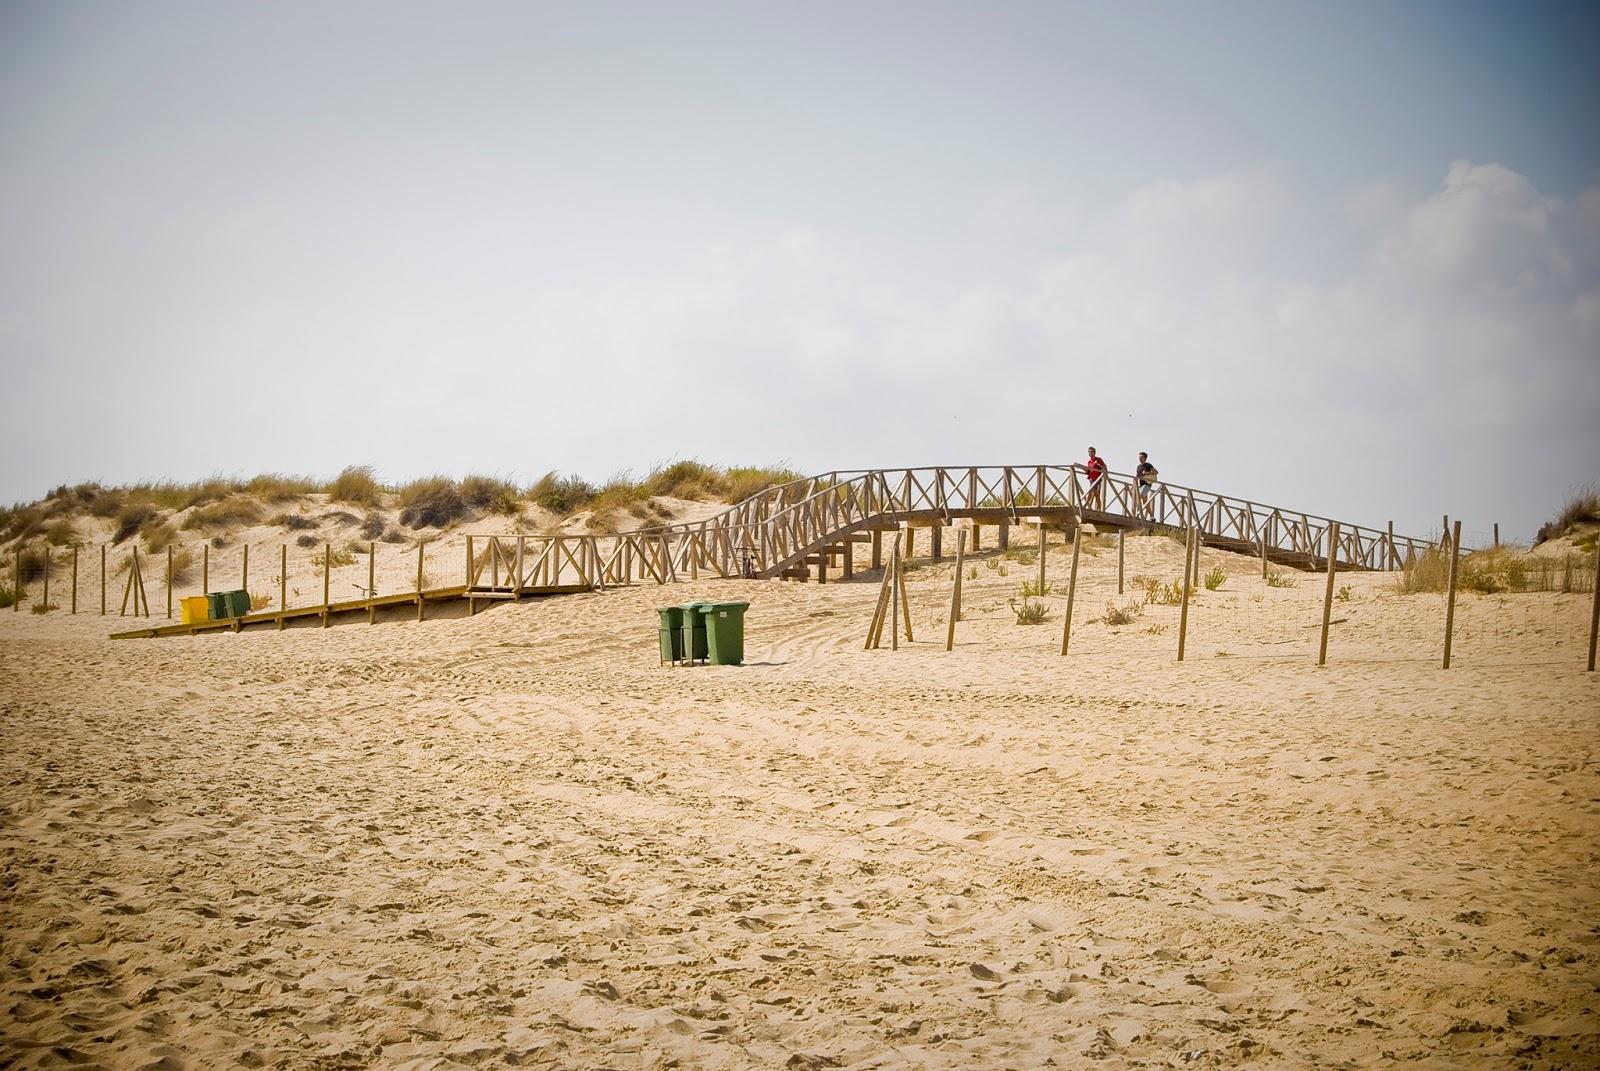 http://www.panoramio.com/photo/114476523